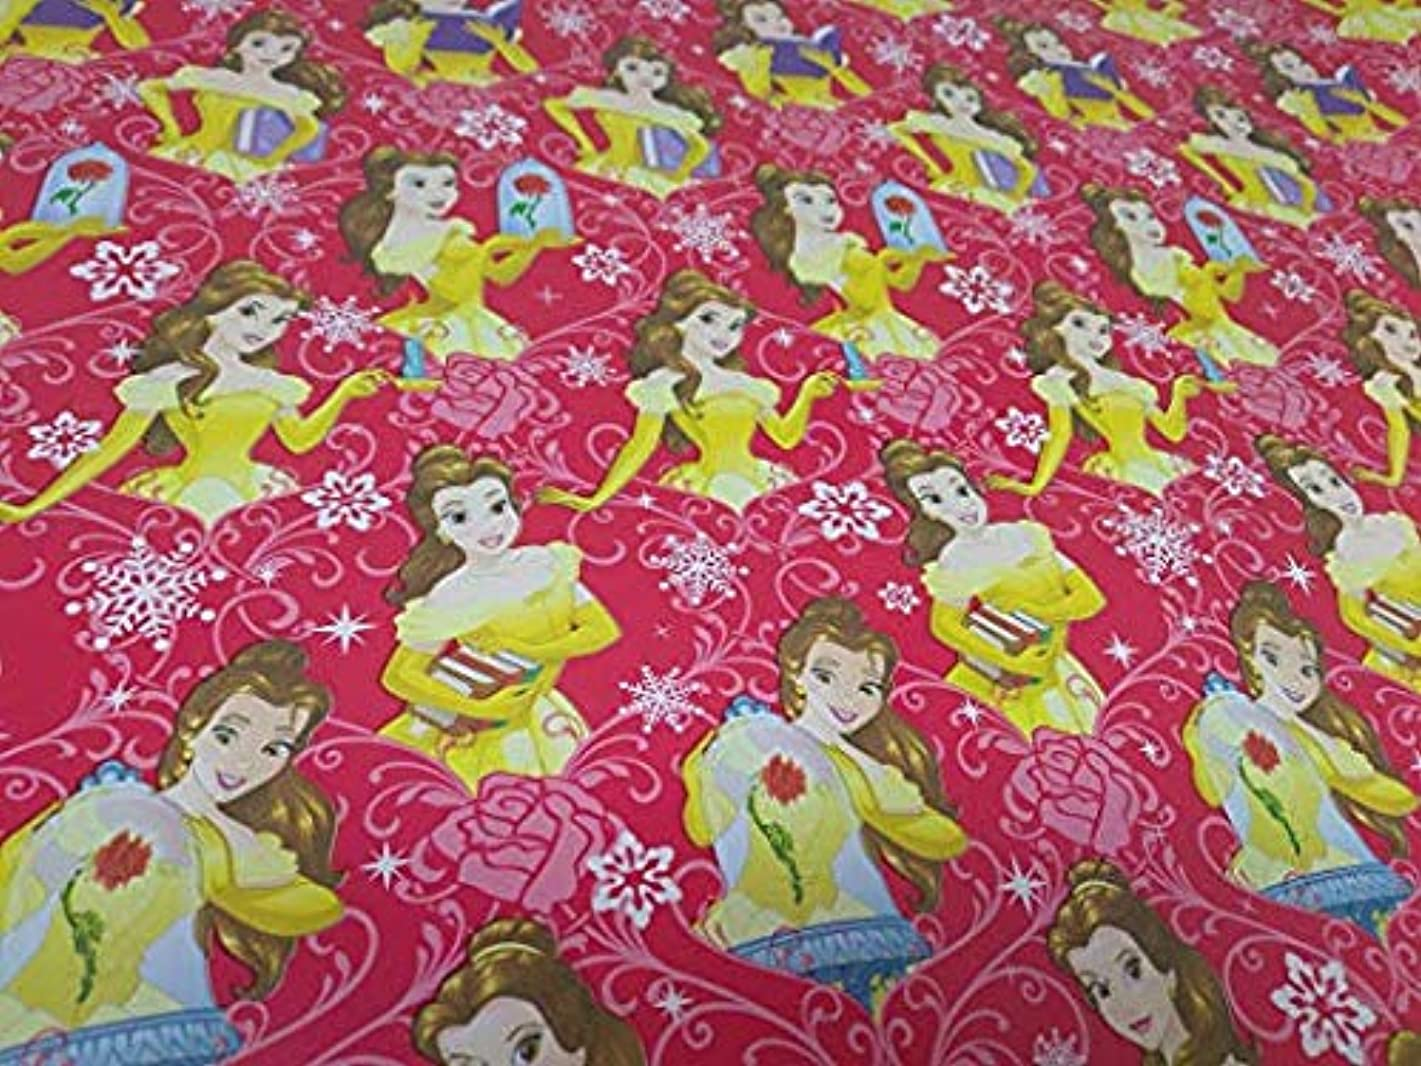 Paper Christmas Wrapping (Bonus Jiggy Themed Writing Tool) Greetings 1 Roll Design Festive Princess Belle Beauty